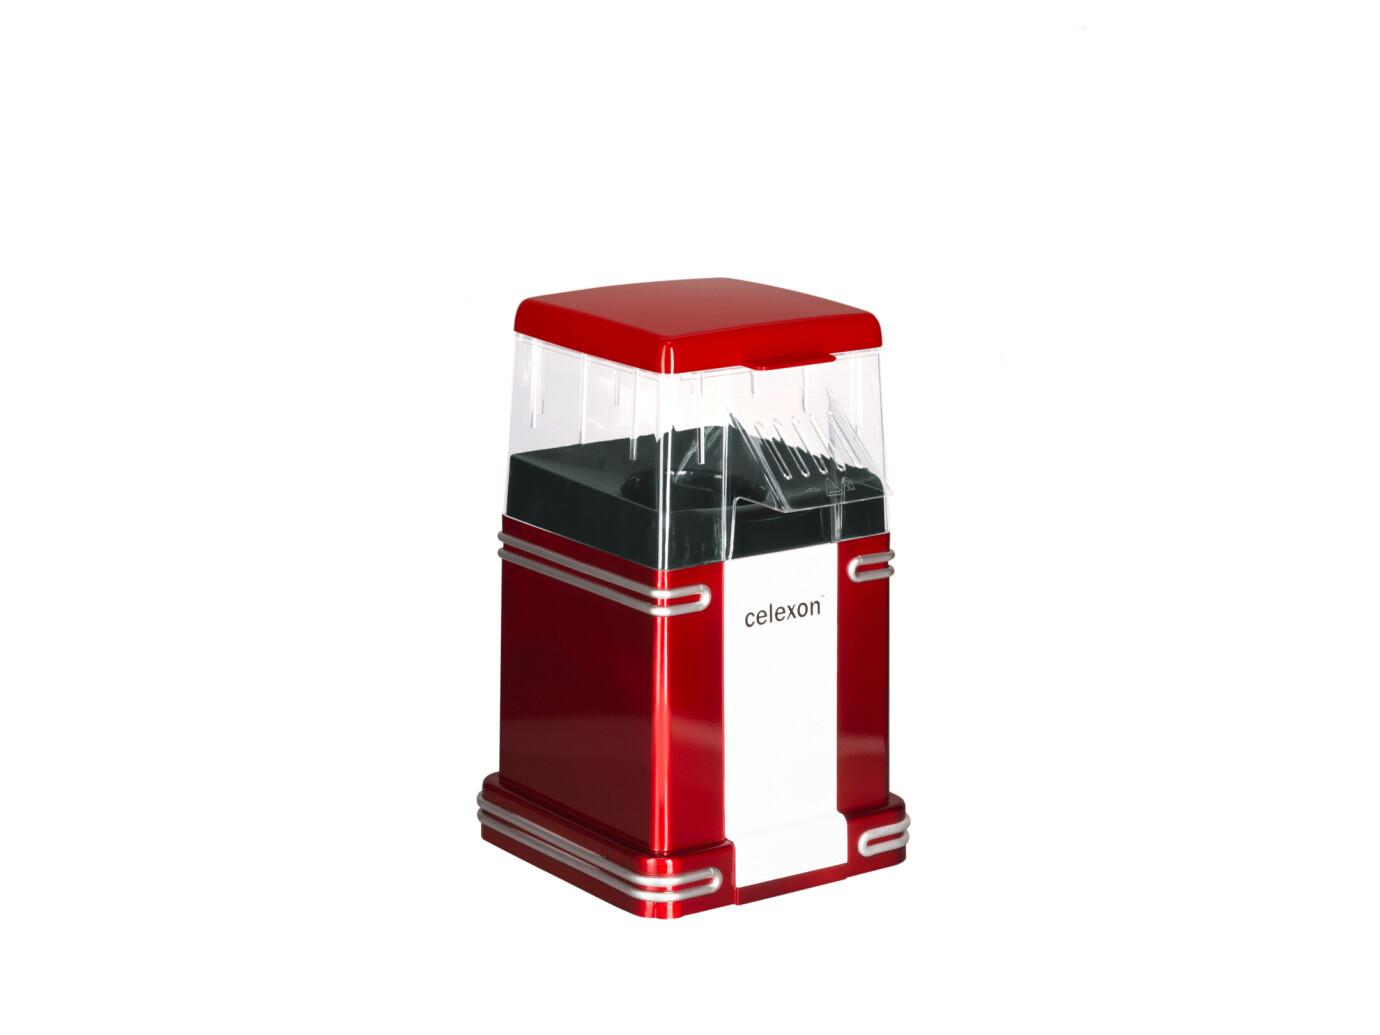 Celexon CinePop CP250 Popcorn Machine